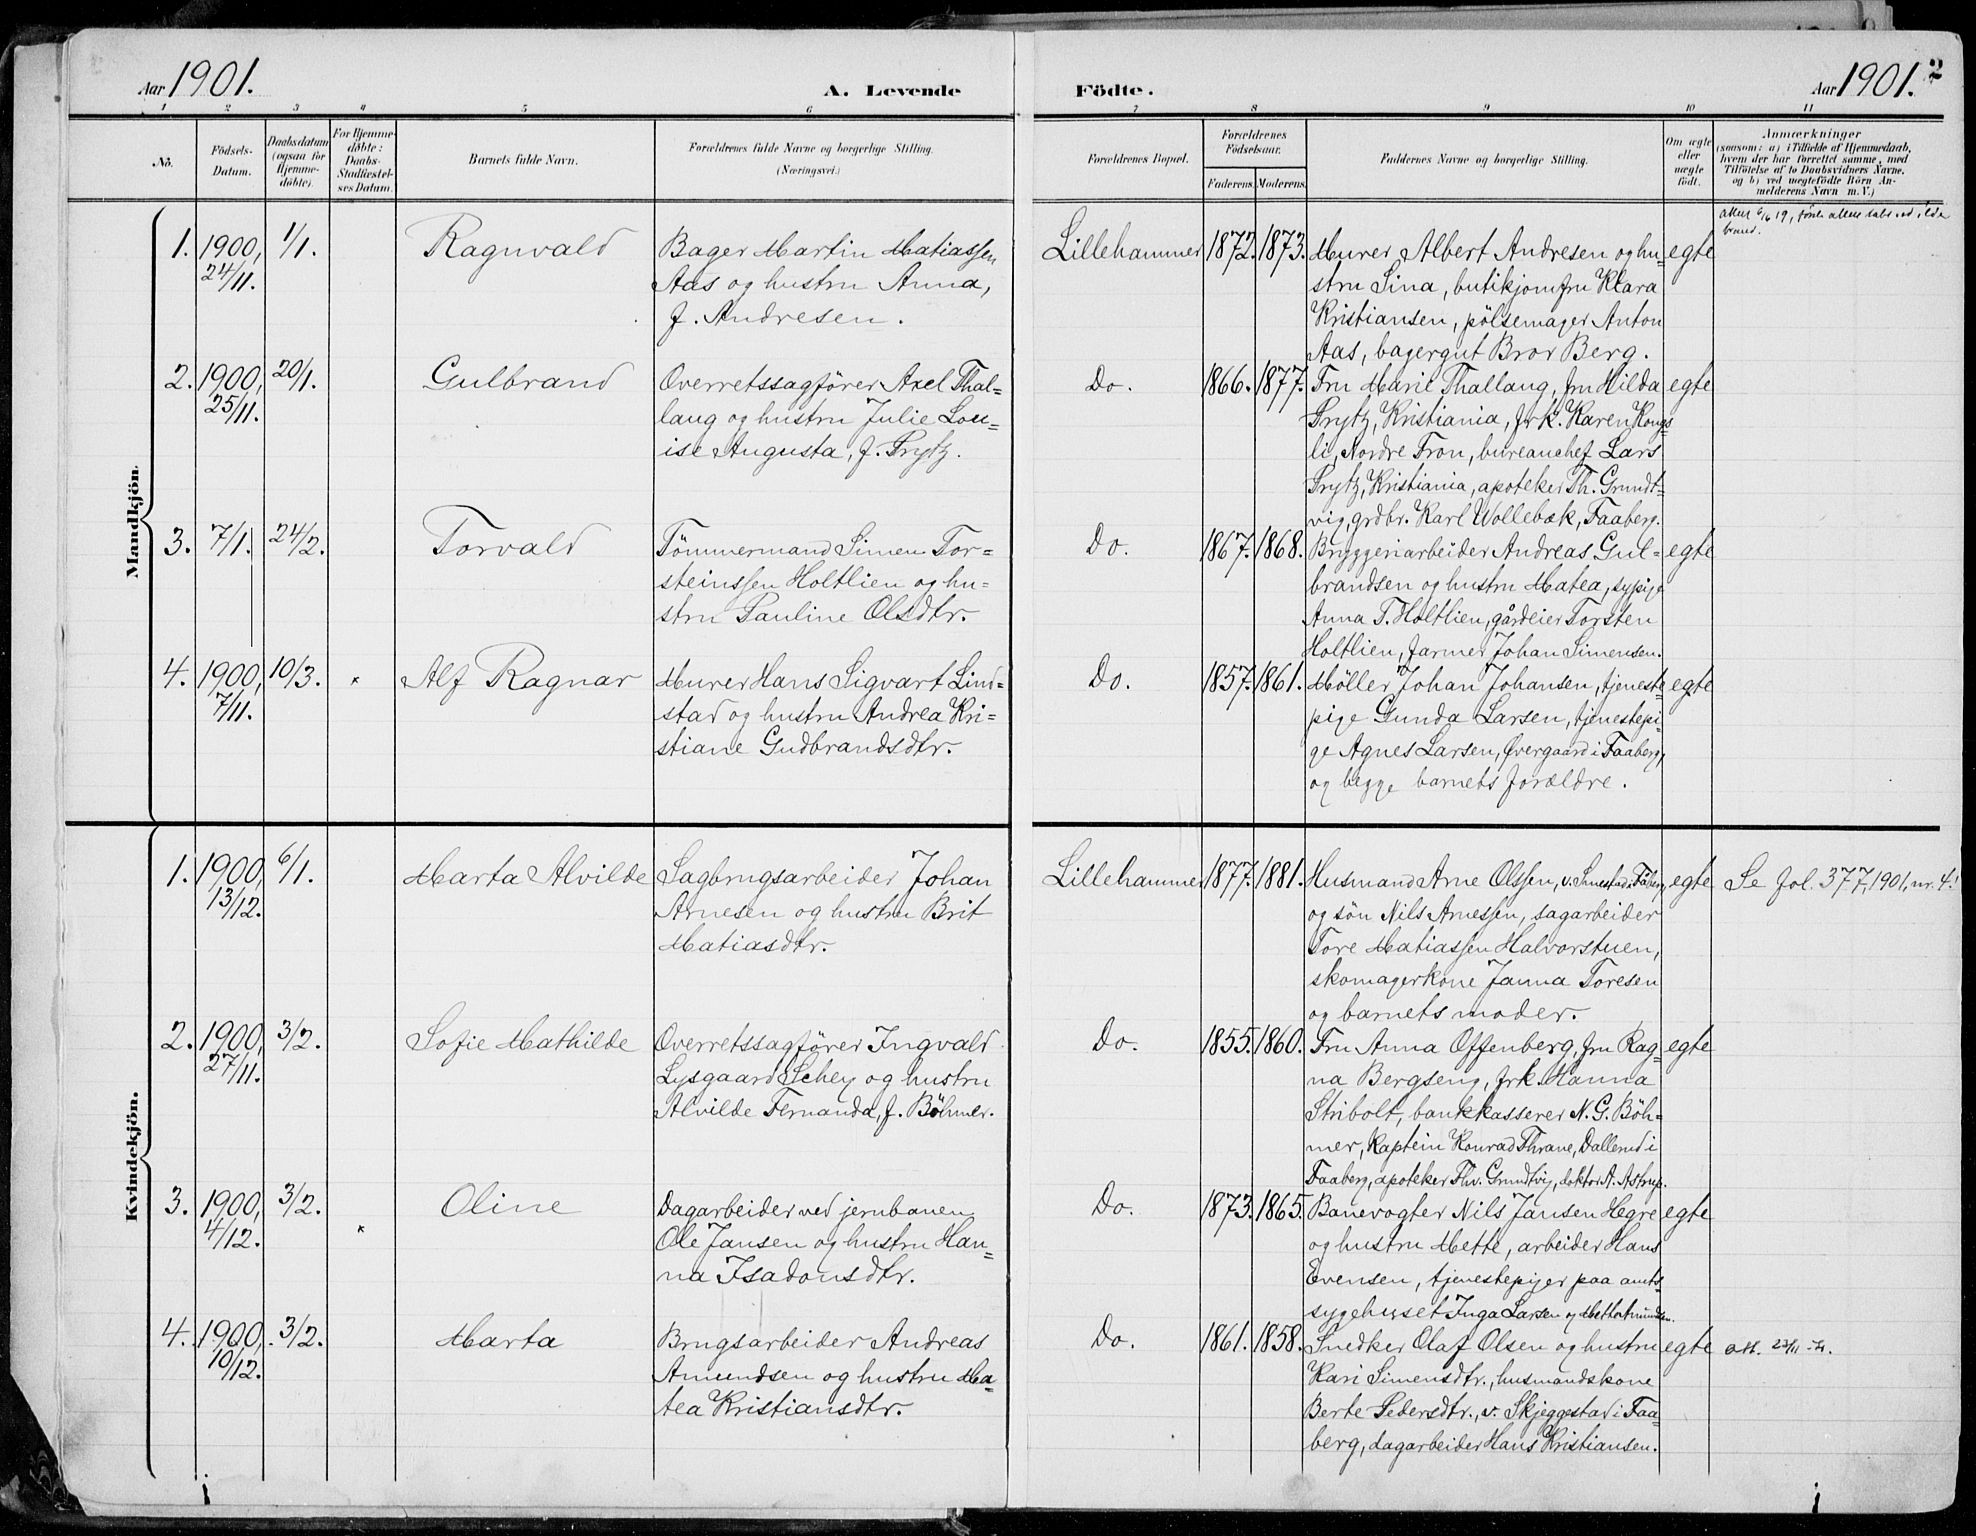 SAH, Lillehammer prestekontor, Ministerialbok nr. 1, 1901-1916, s. 2